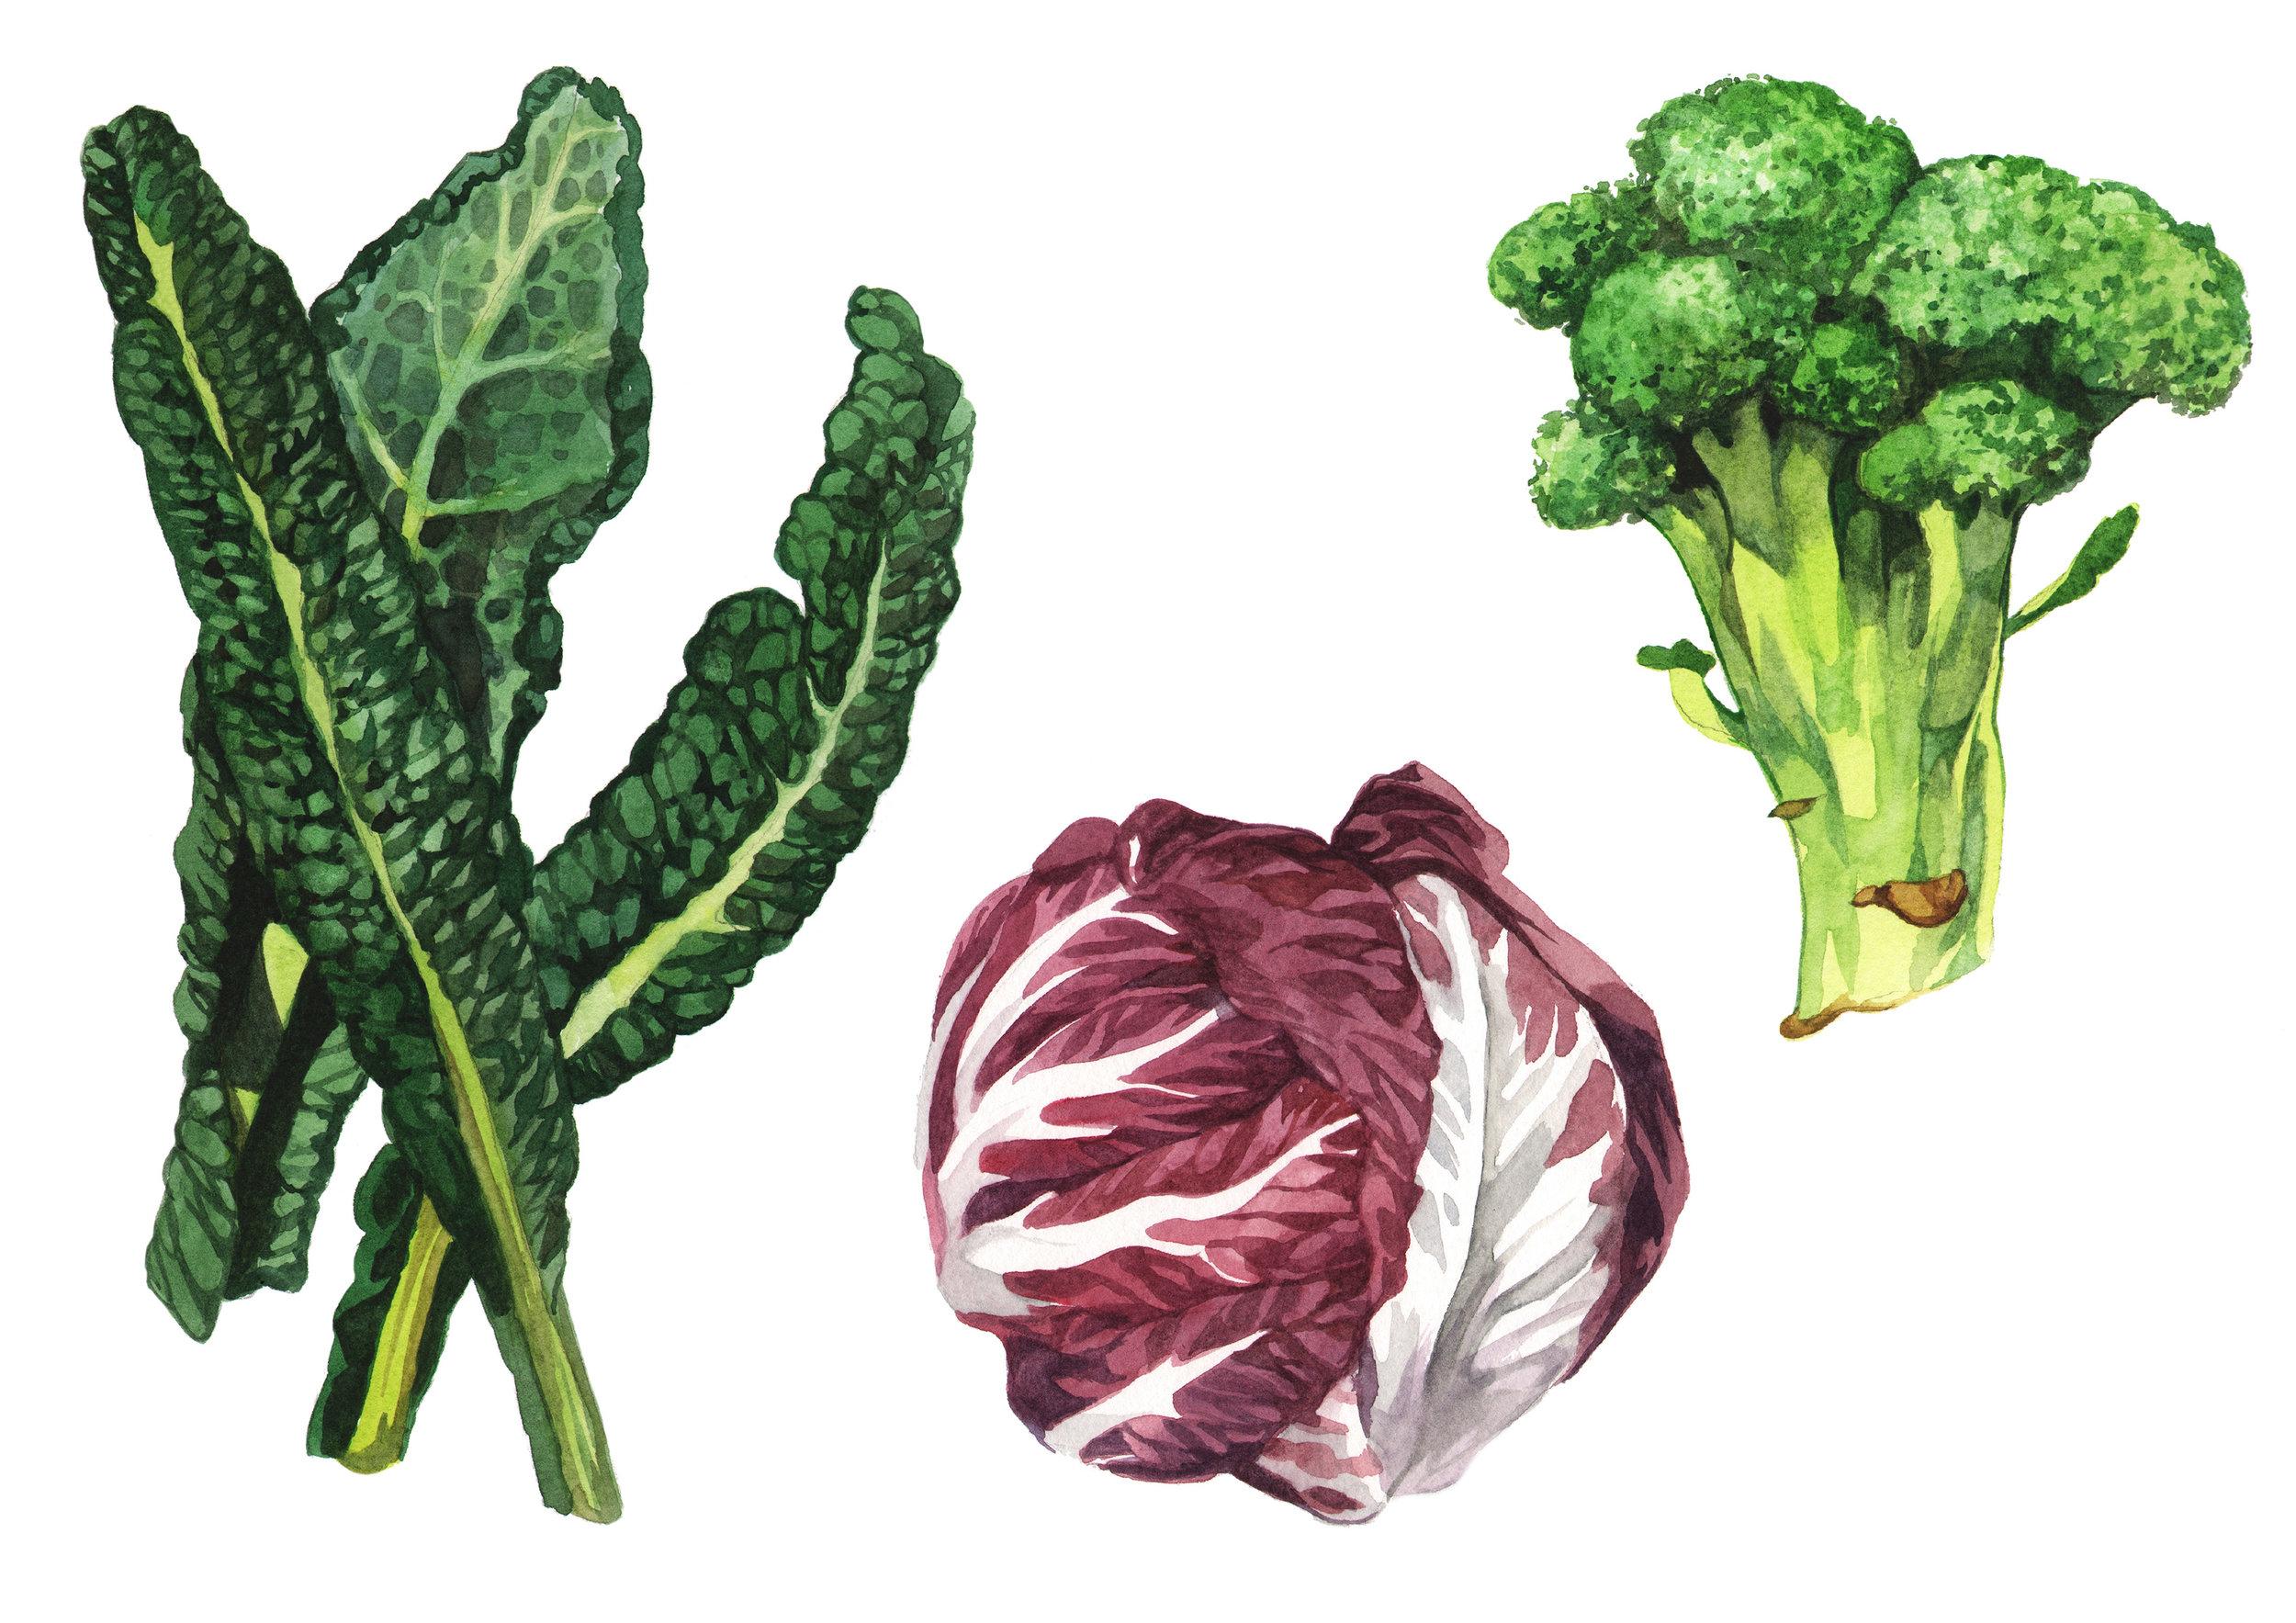 cabbage-kale-broccoli.jpg